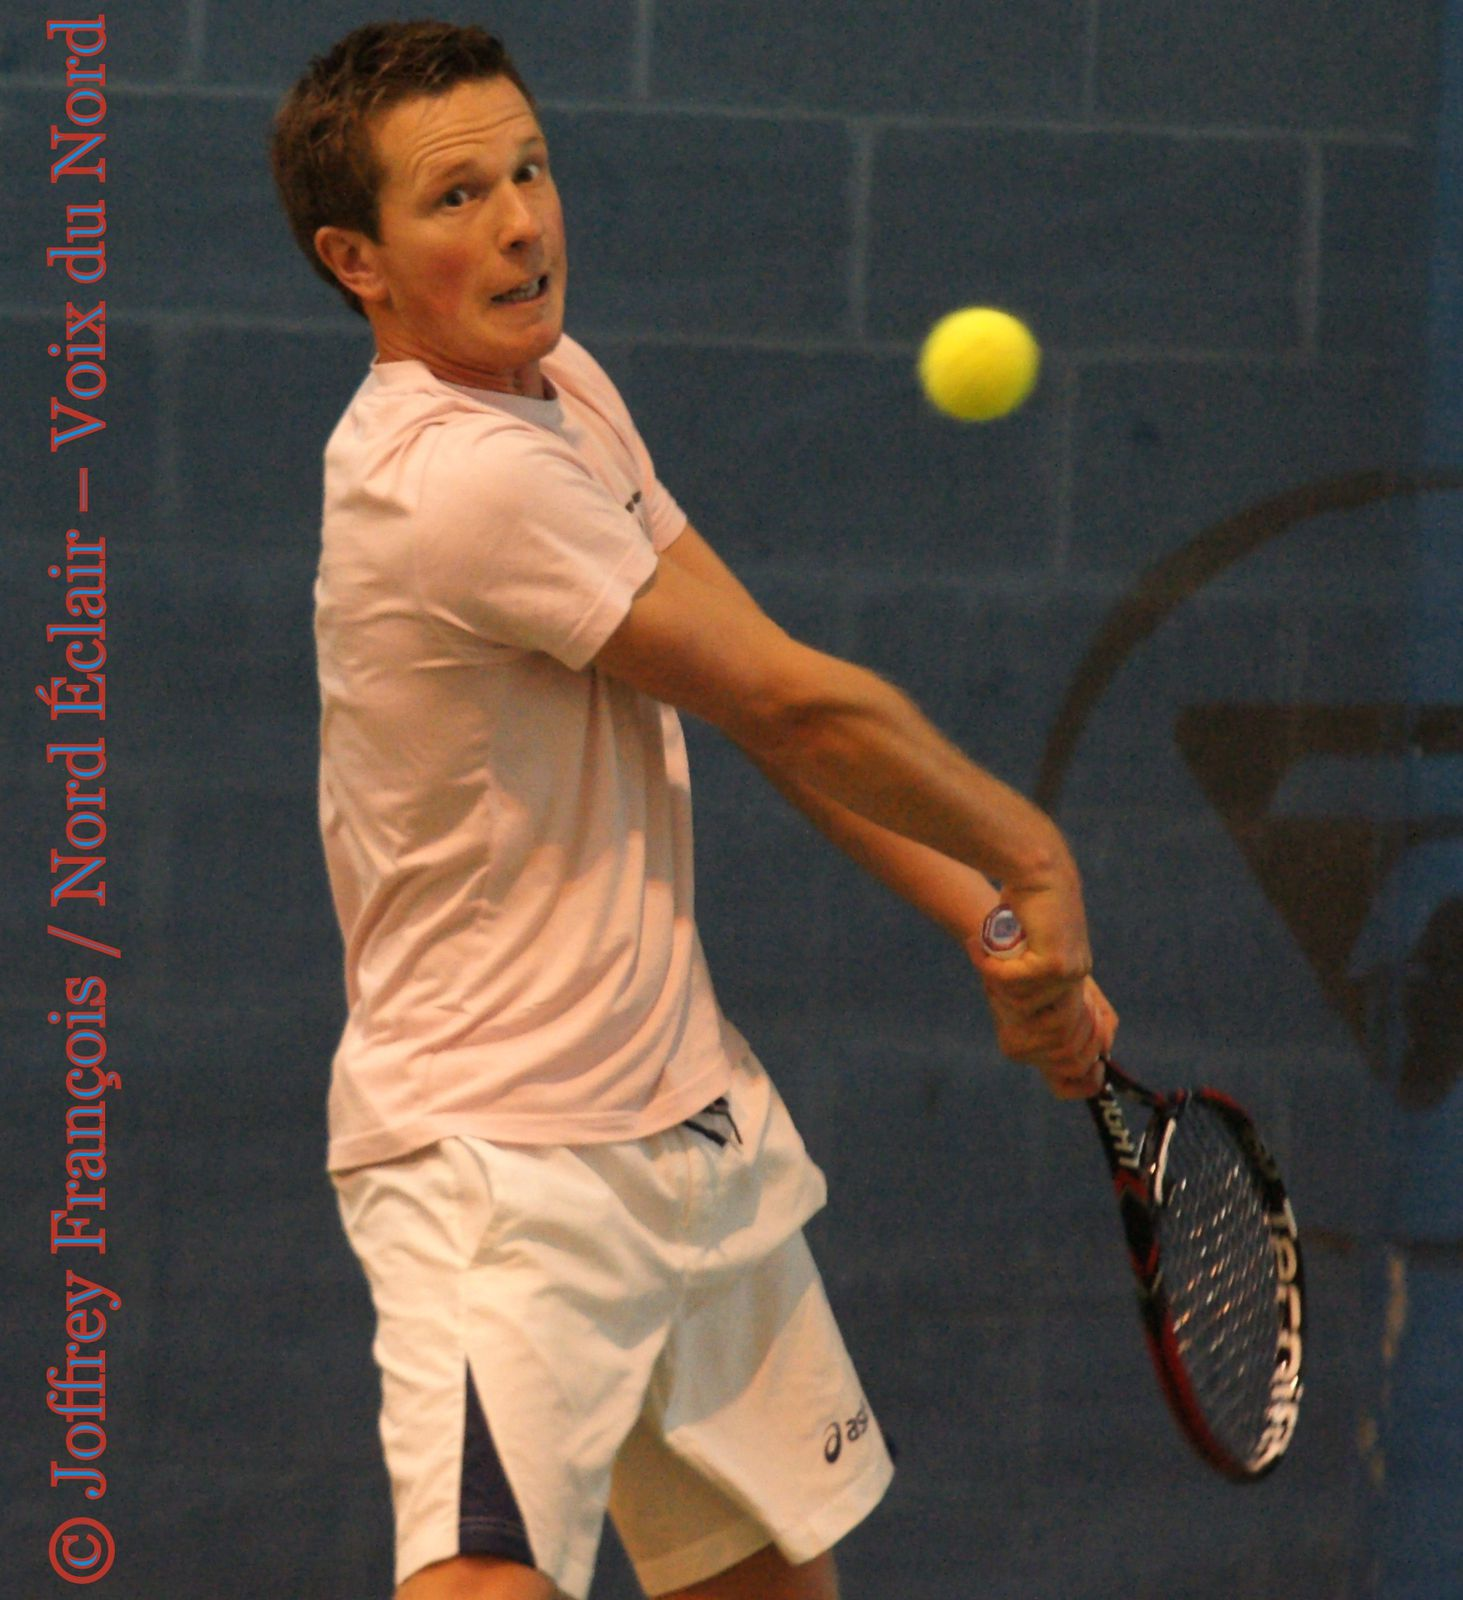 19.10.13 Tennis Toufflers